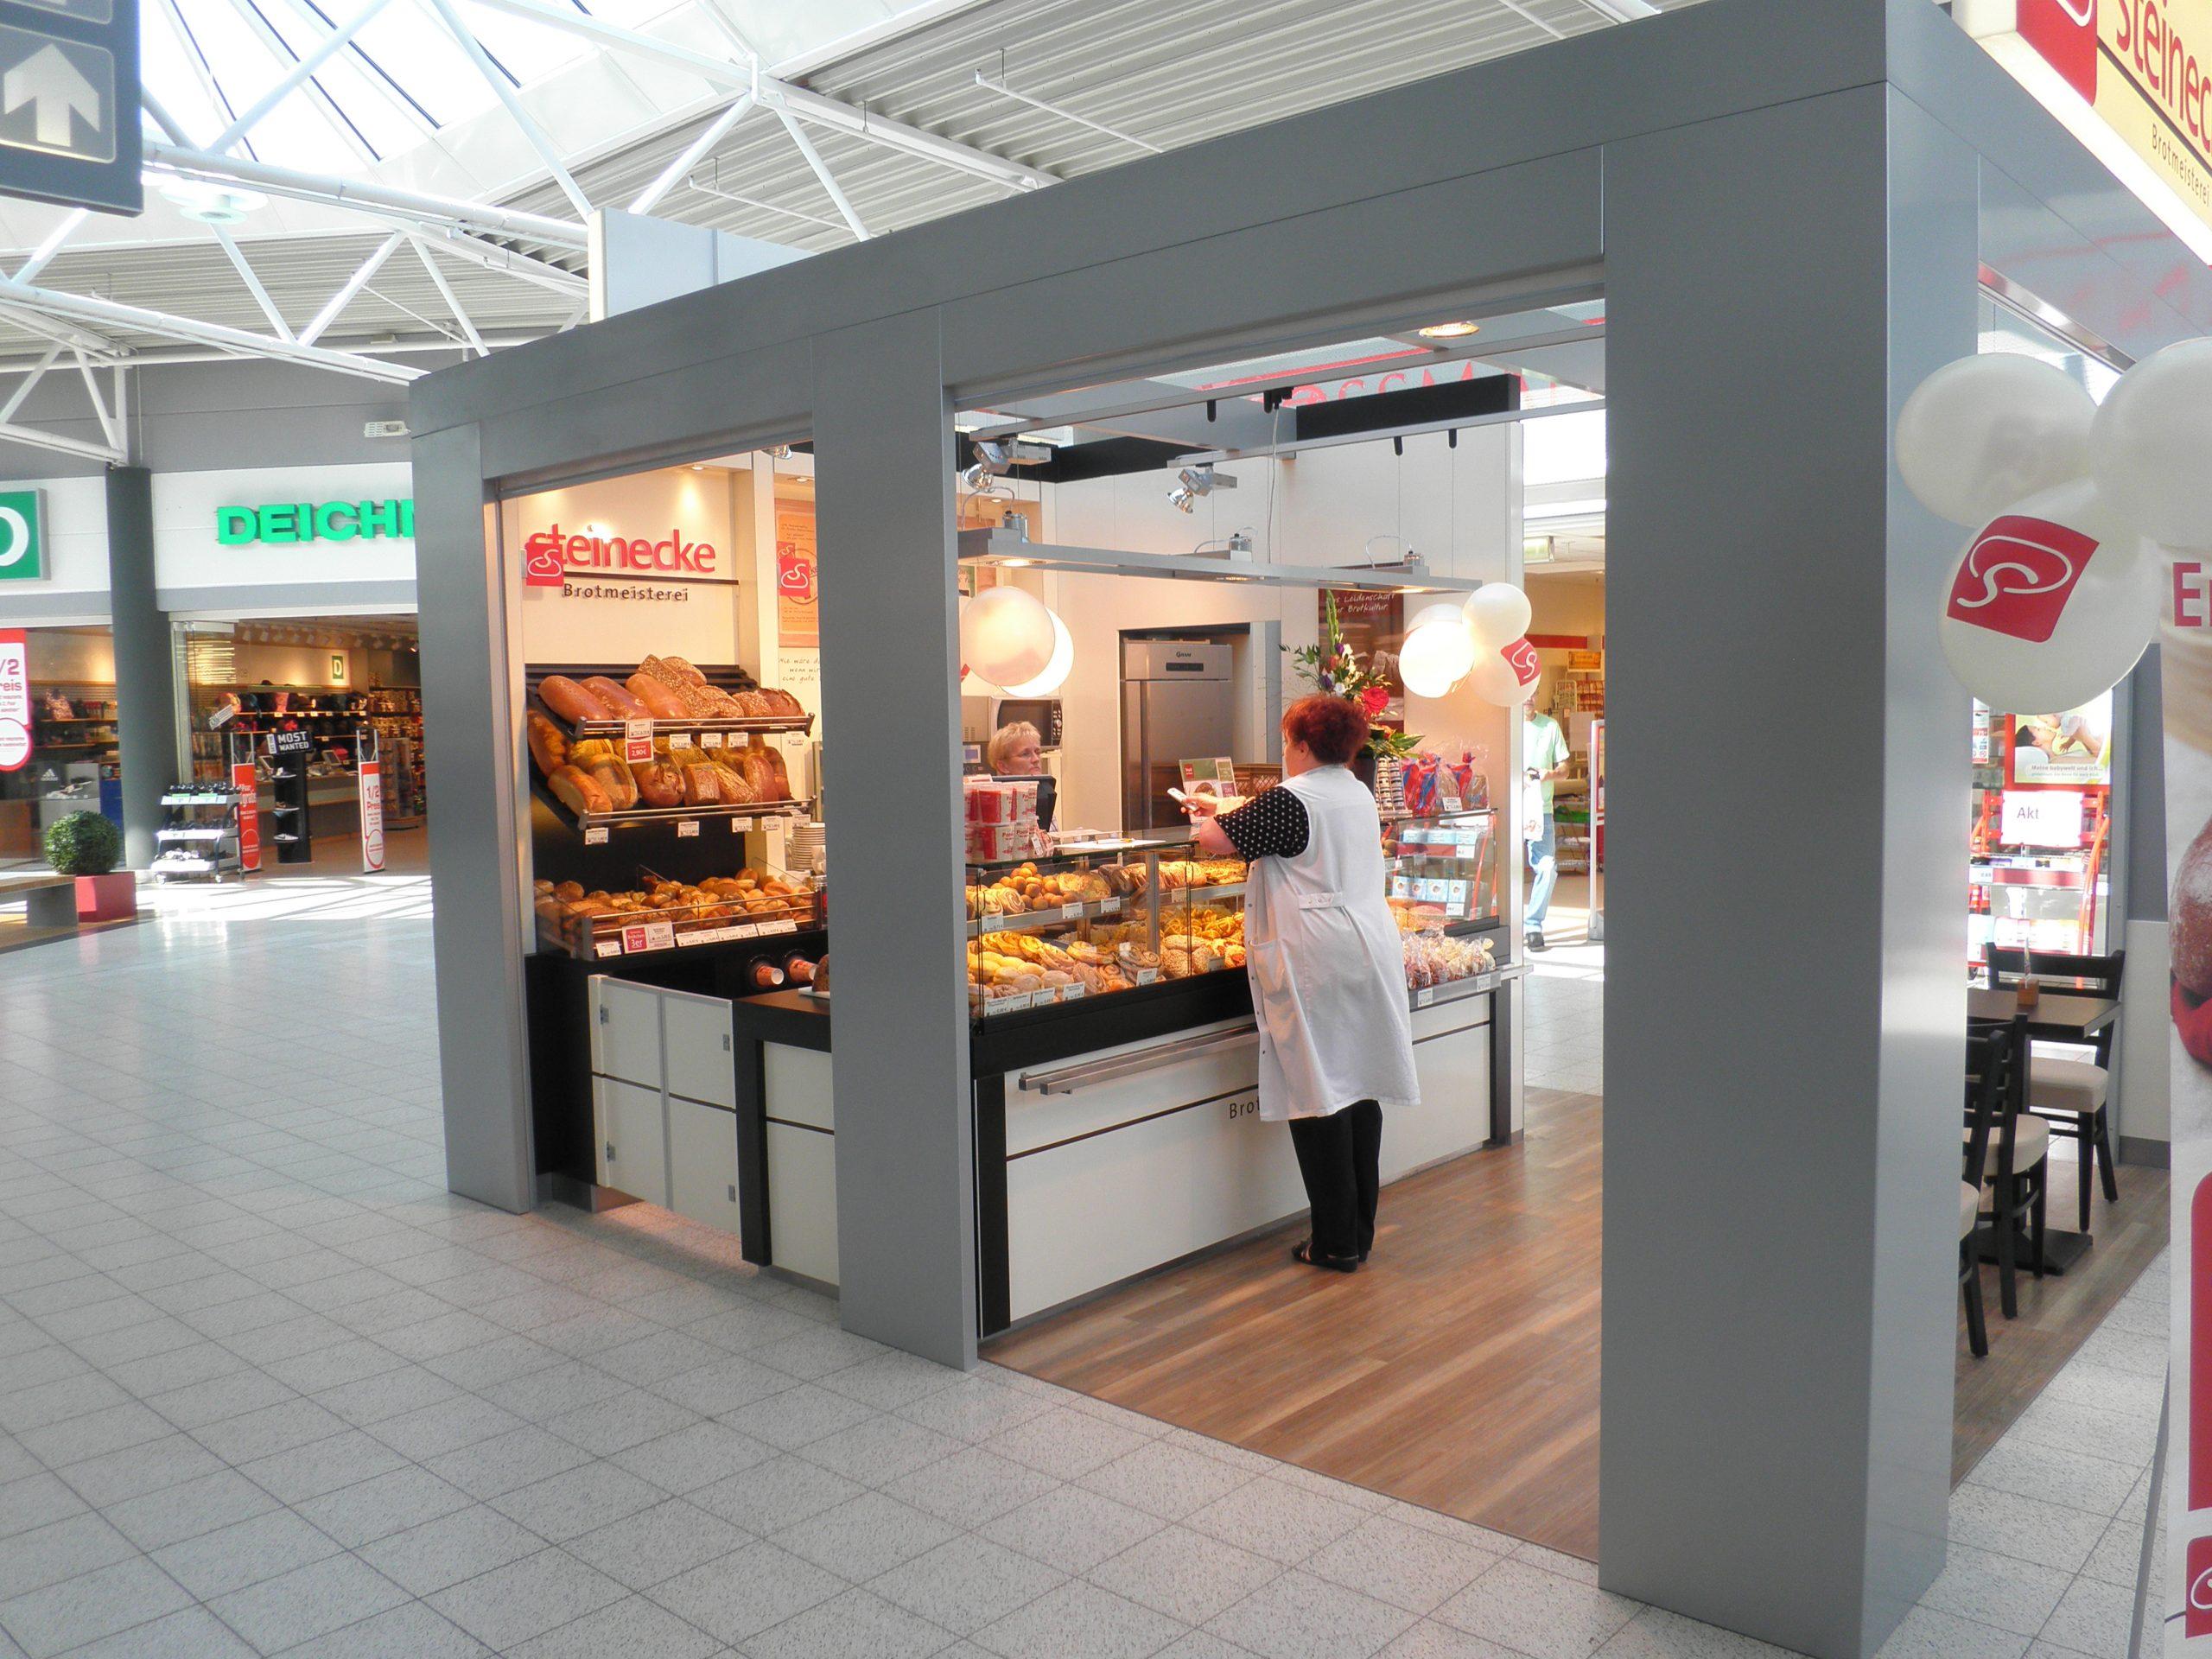 Bäcker Brötchen Brot Kiosk Pavillon Mall Verkaufsstand Einkaufszentrum Indoor Cube